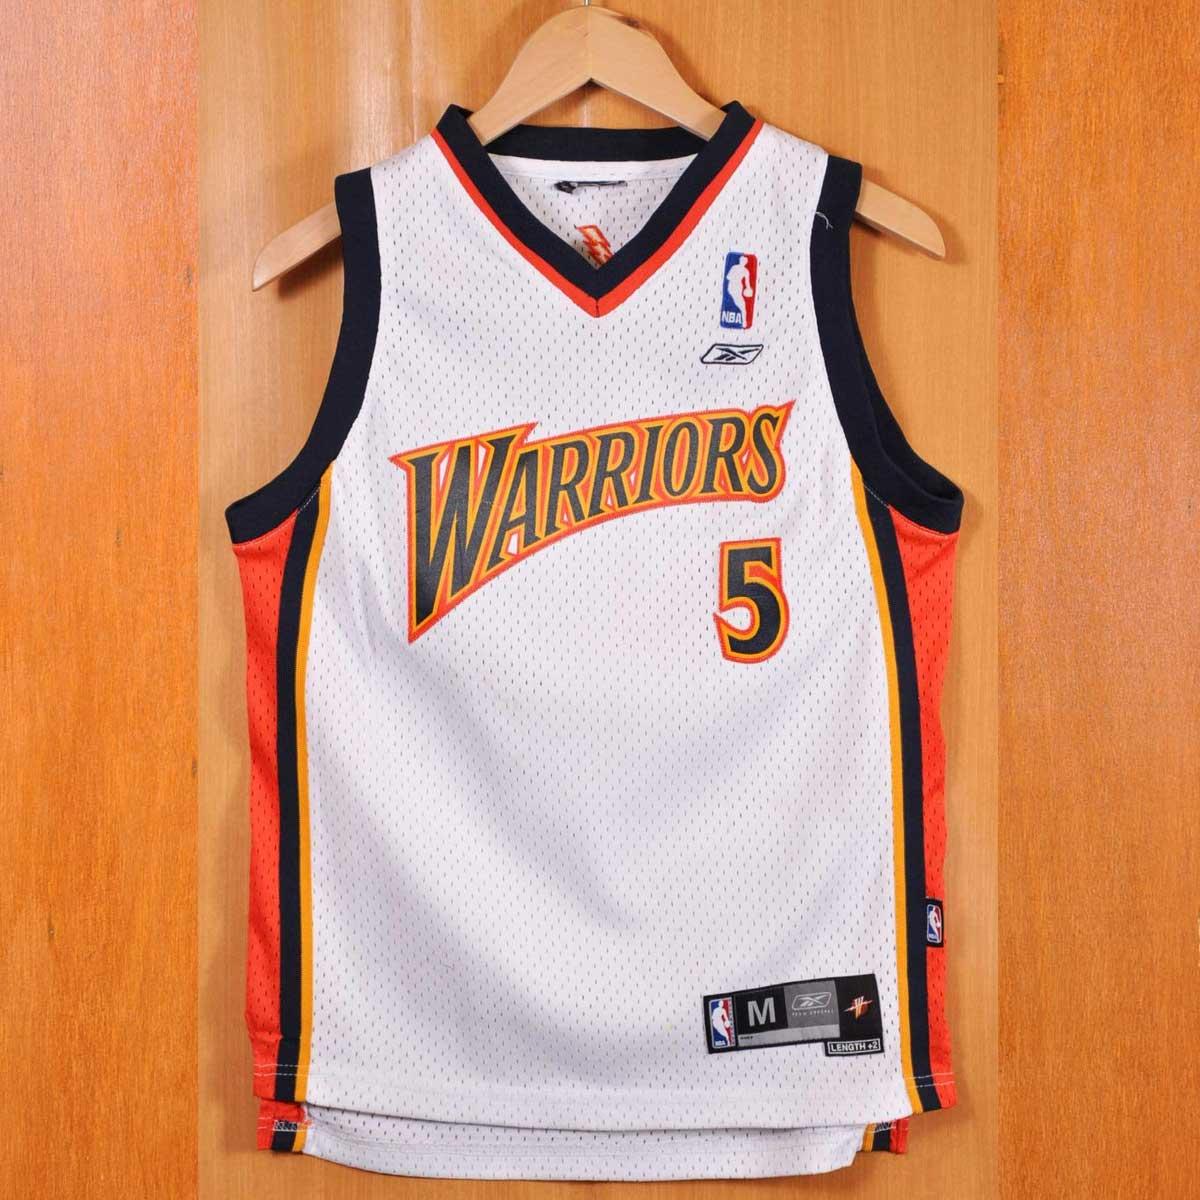 ed2d3bee245 Reebok Reebok NBA Golden State Warriors Golden State Warriors baron Davis  basketball tank top uniform numbering ...